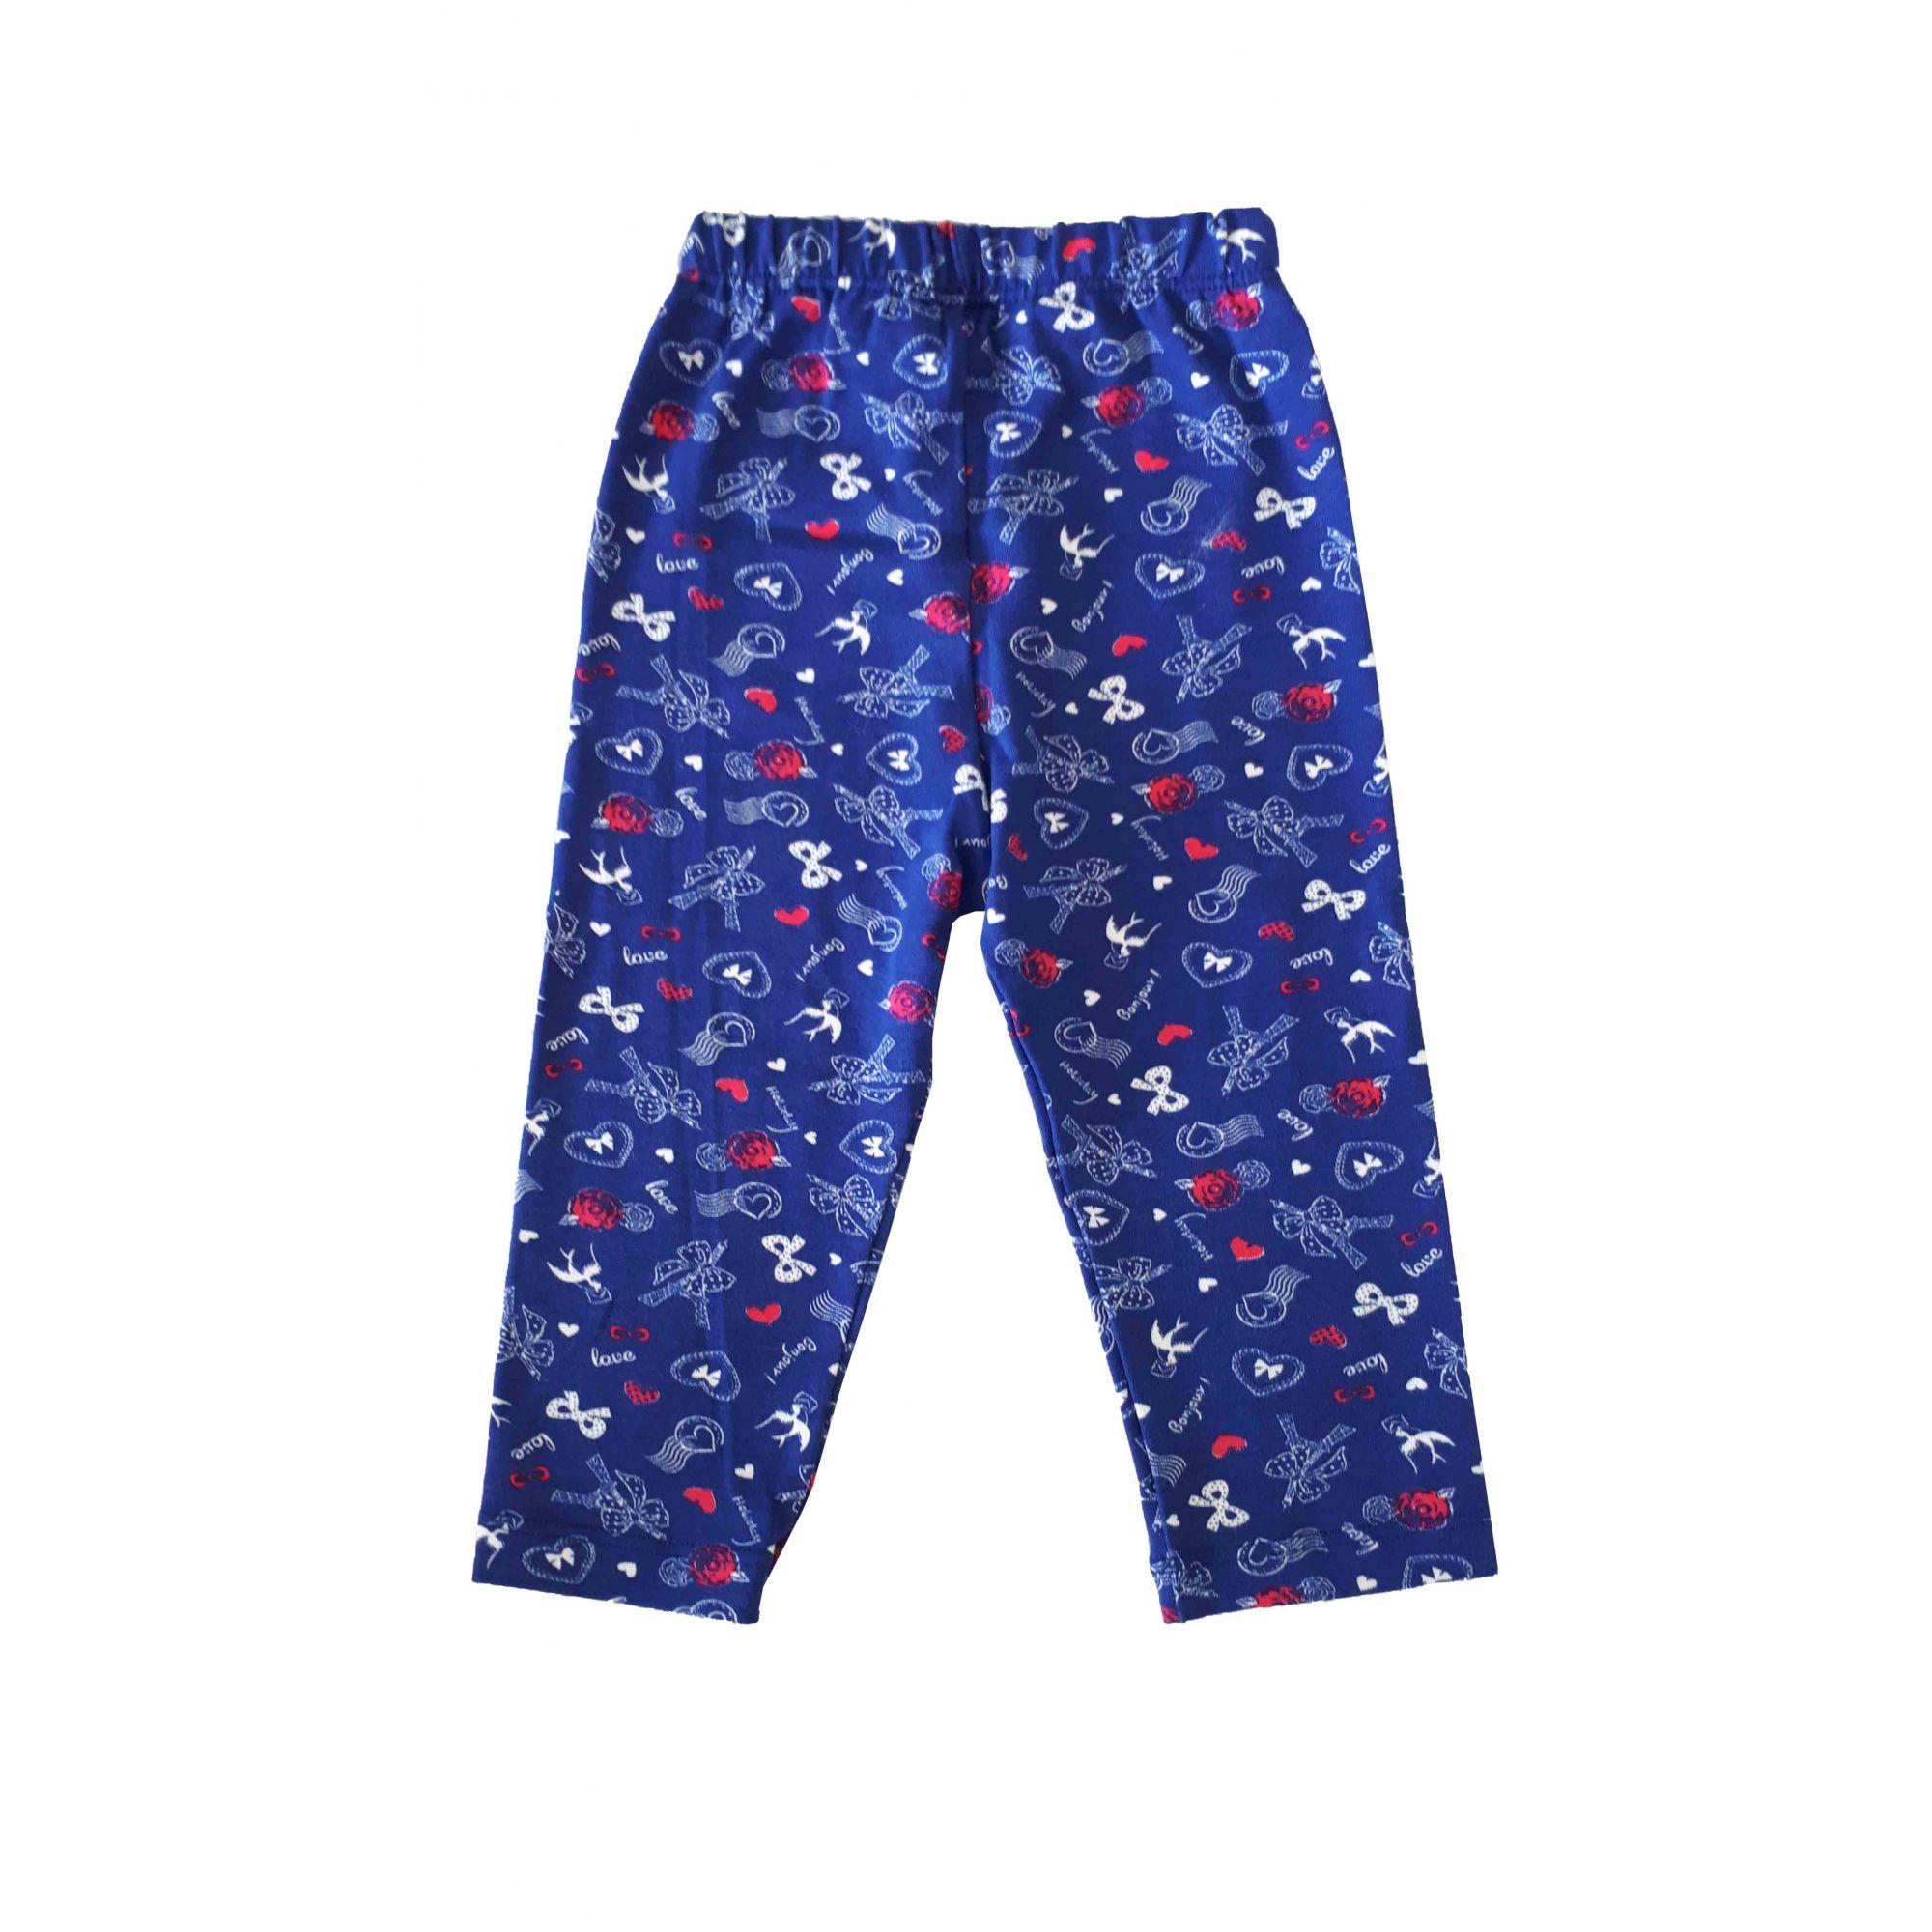 Kit 2 Legging bebê e 2 laços Zip Toys  Rosa/Azul/ Tamanho 6 a 12 meses